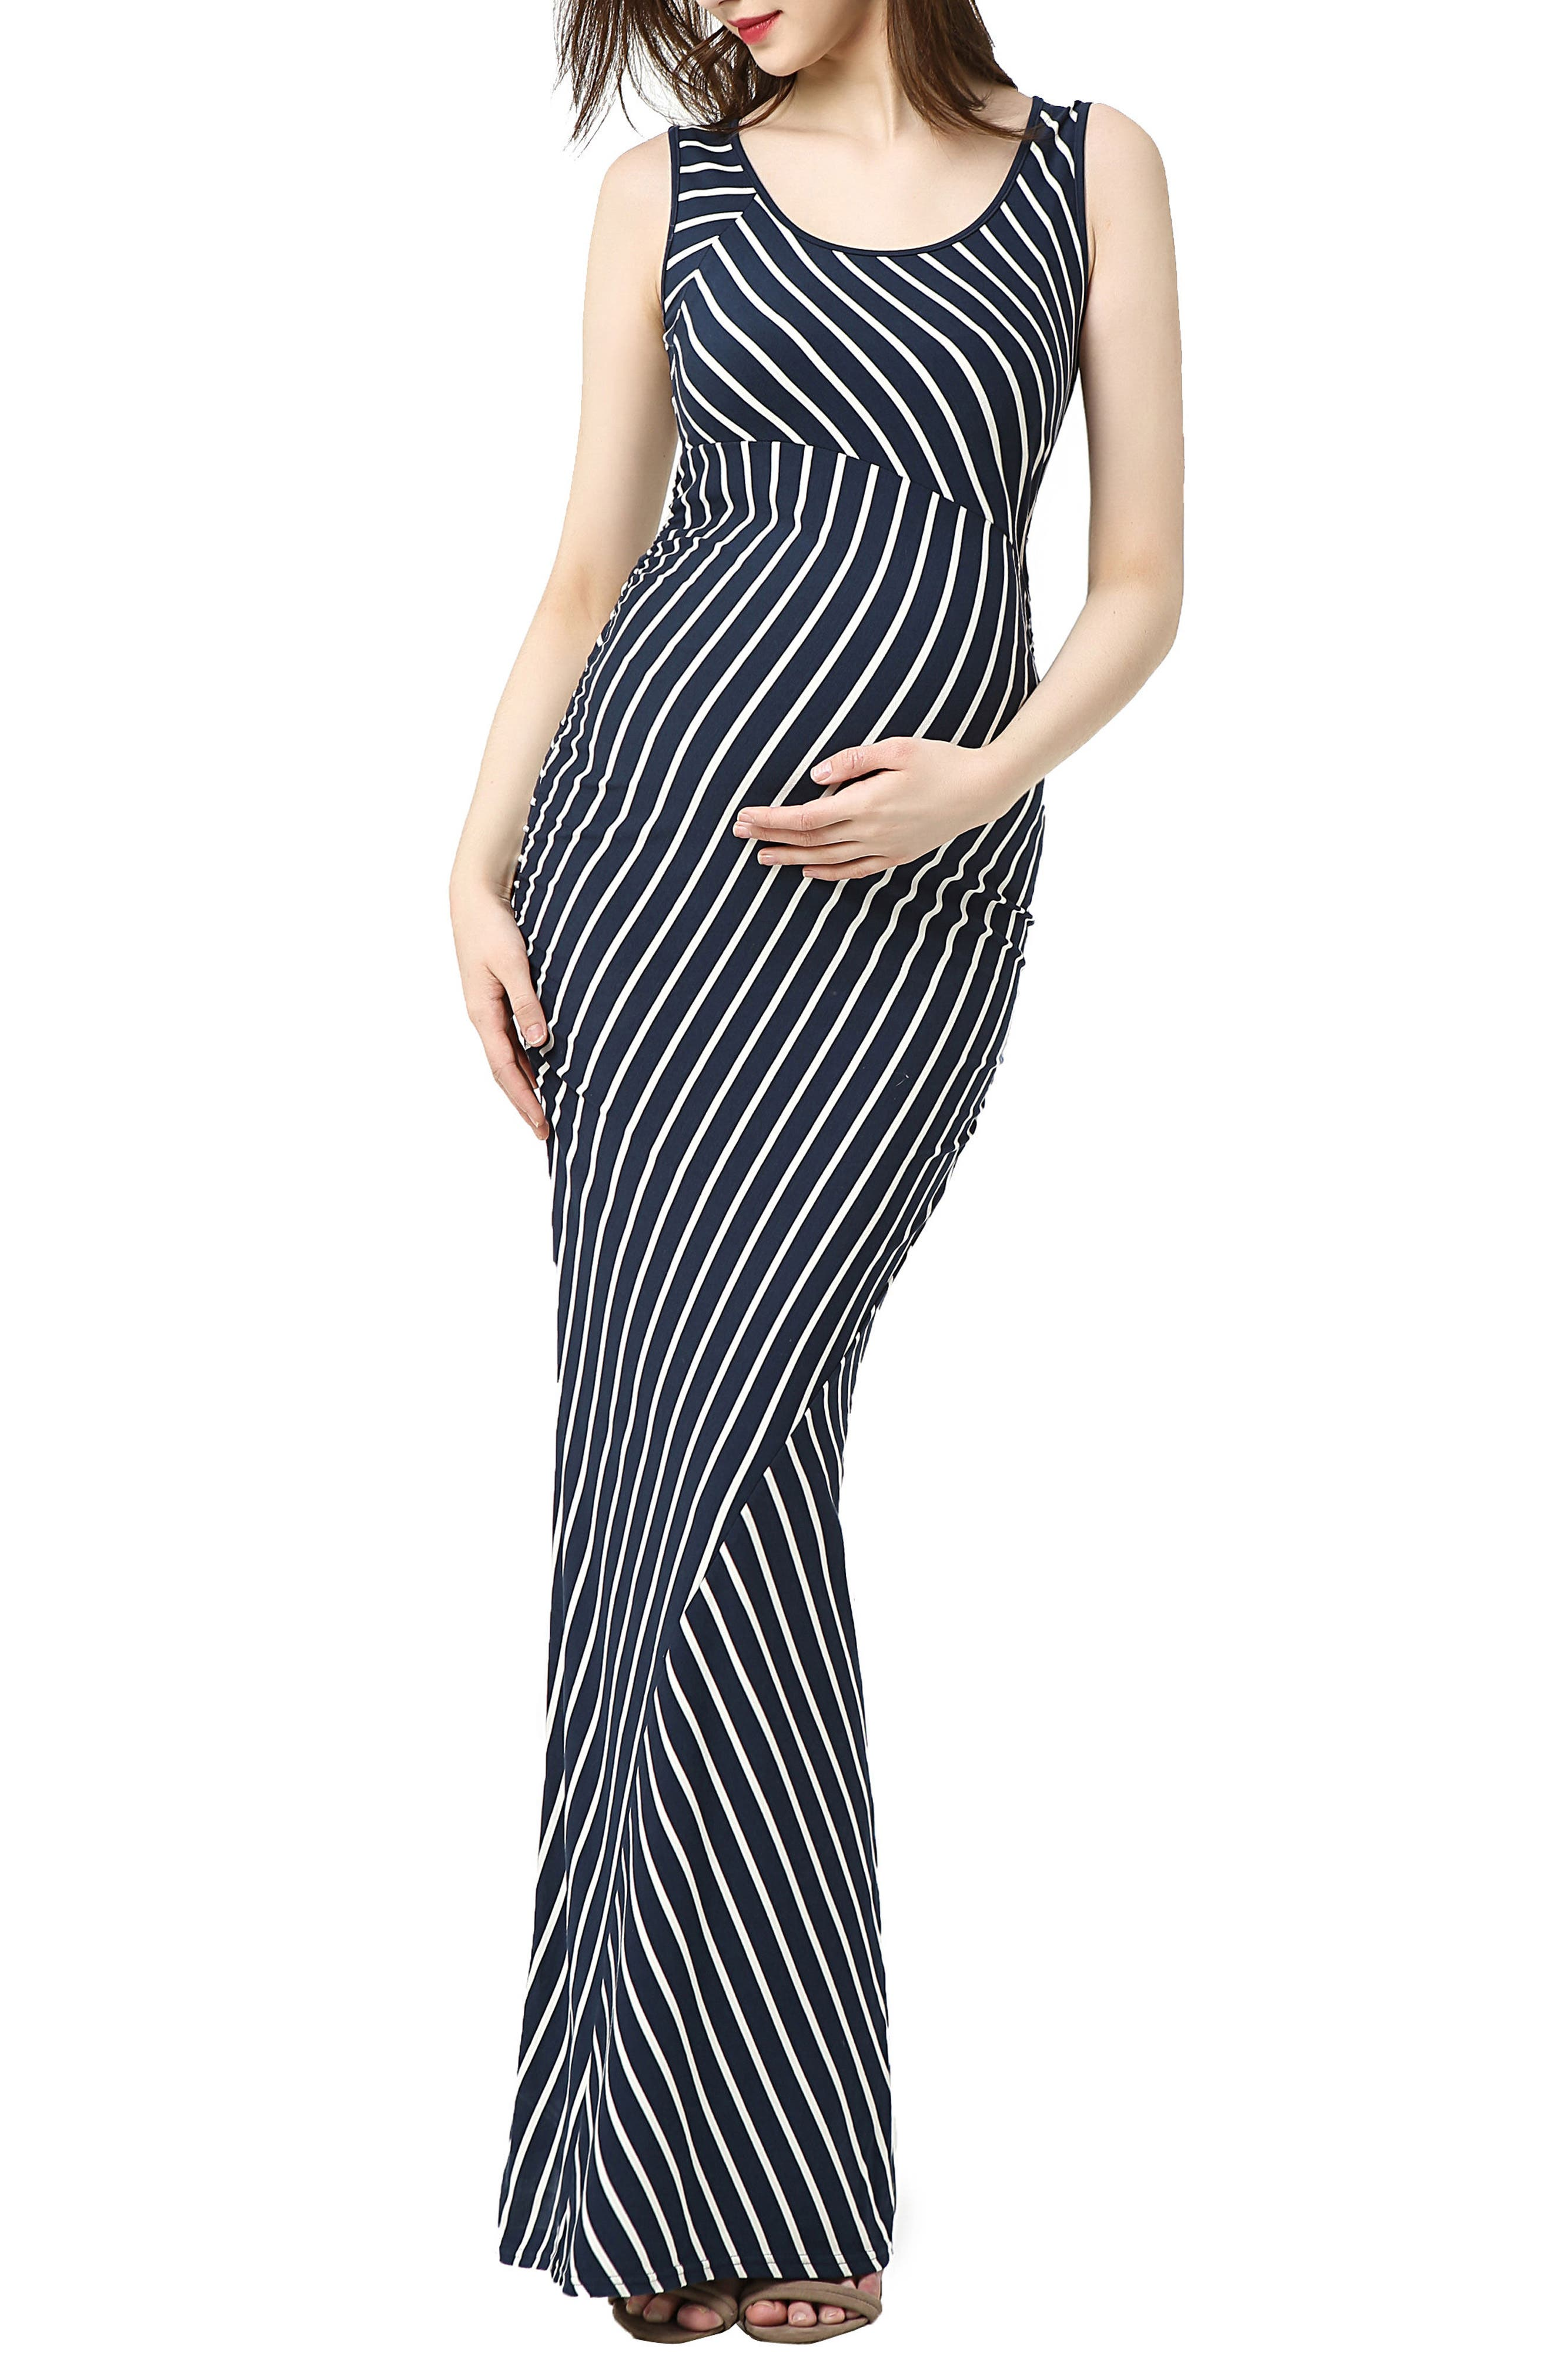 Peyton Stripe Maxi Maternity Dress,                         Main,                         color, NAVY/ IVORY